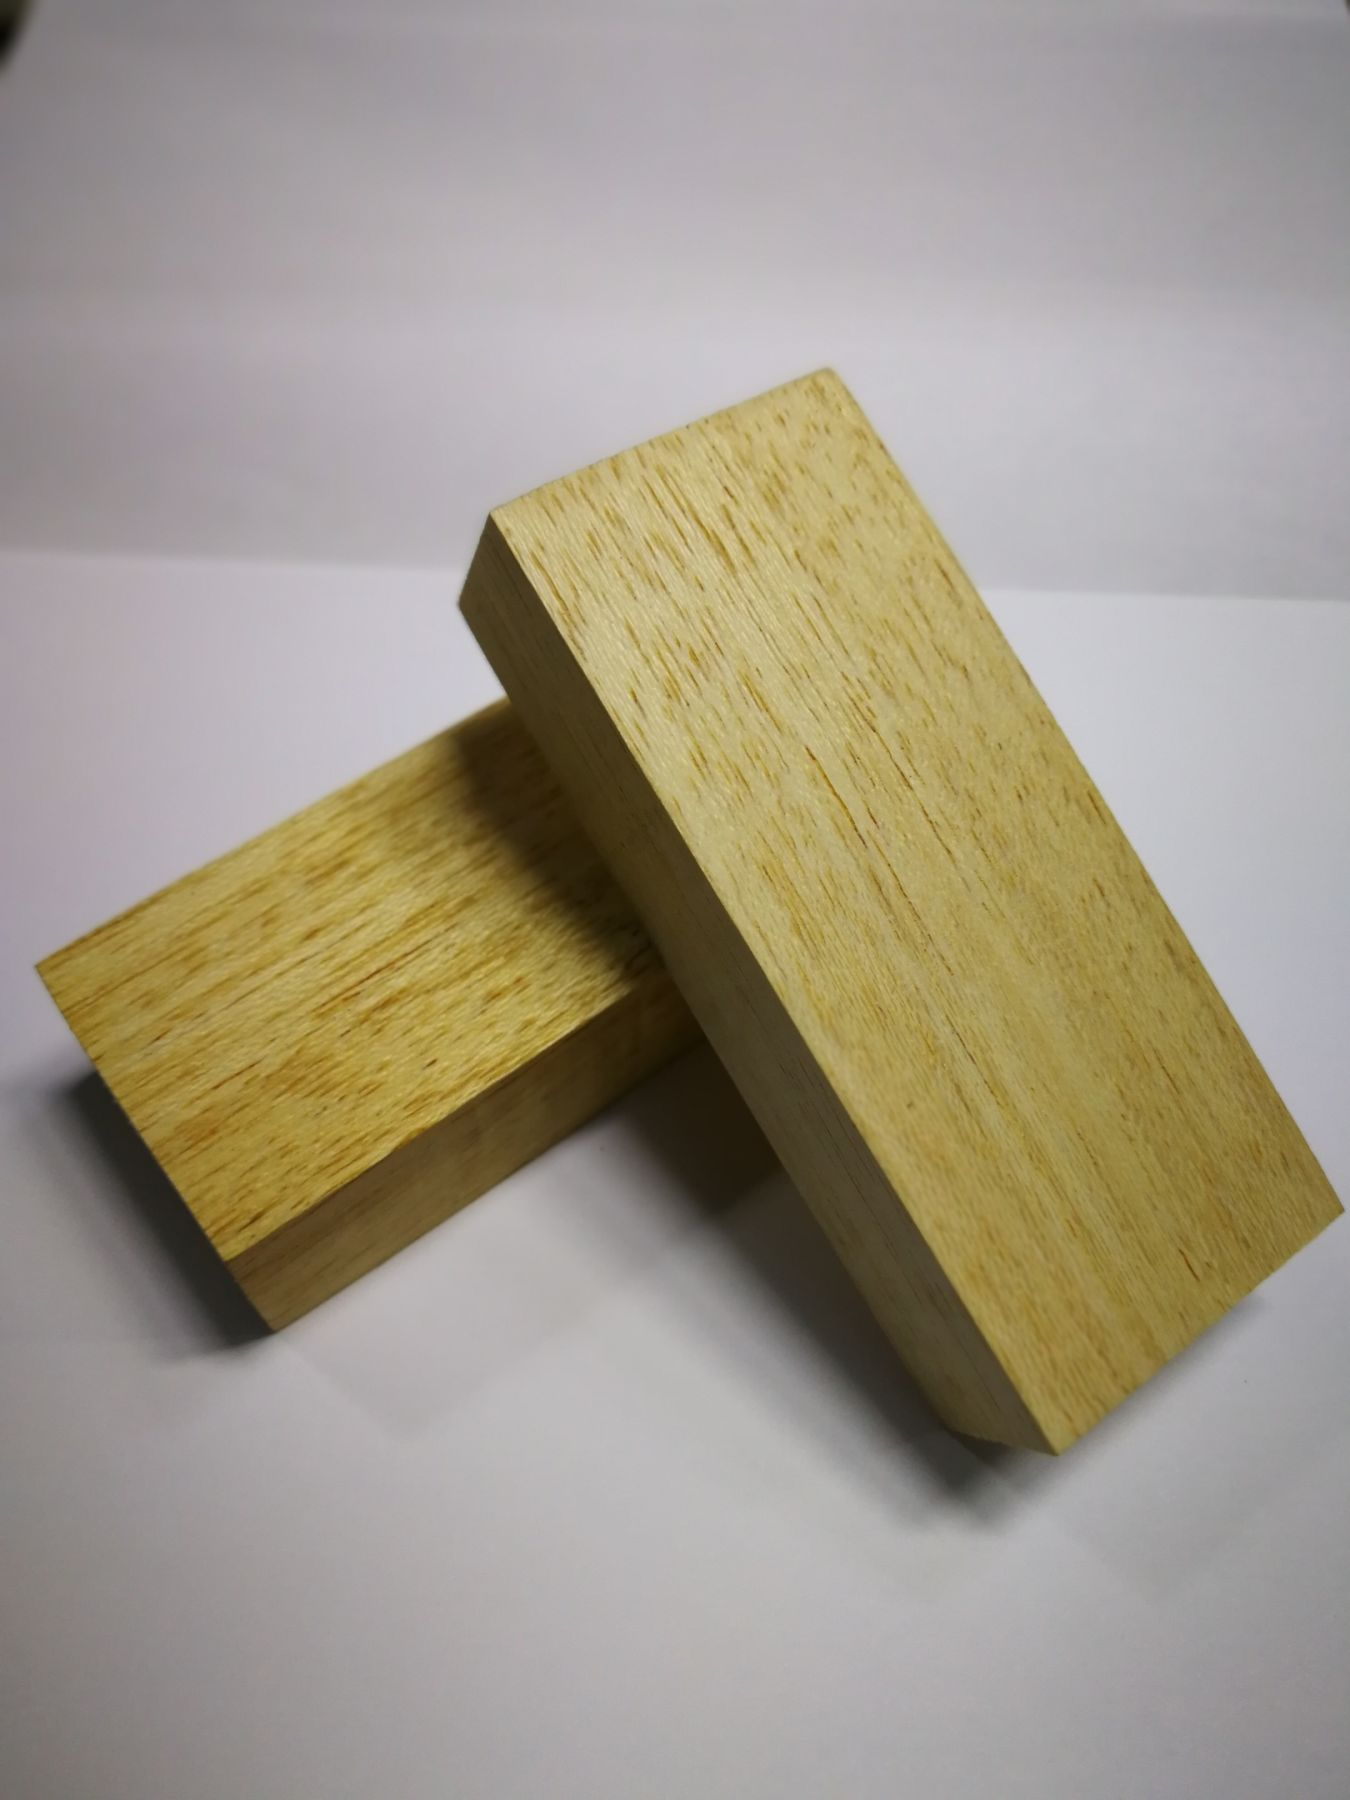 Кото (koto) плашки 5-7-10-14 мм (толщина выбирается при клике на товар)